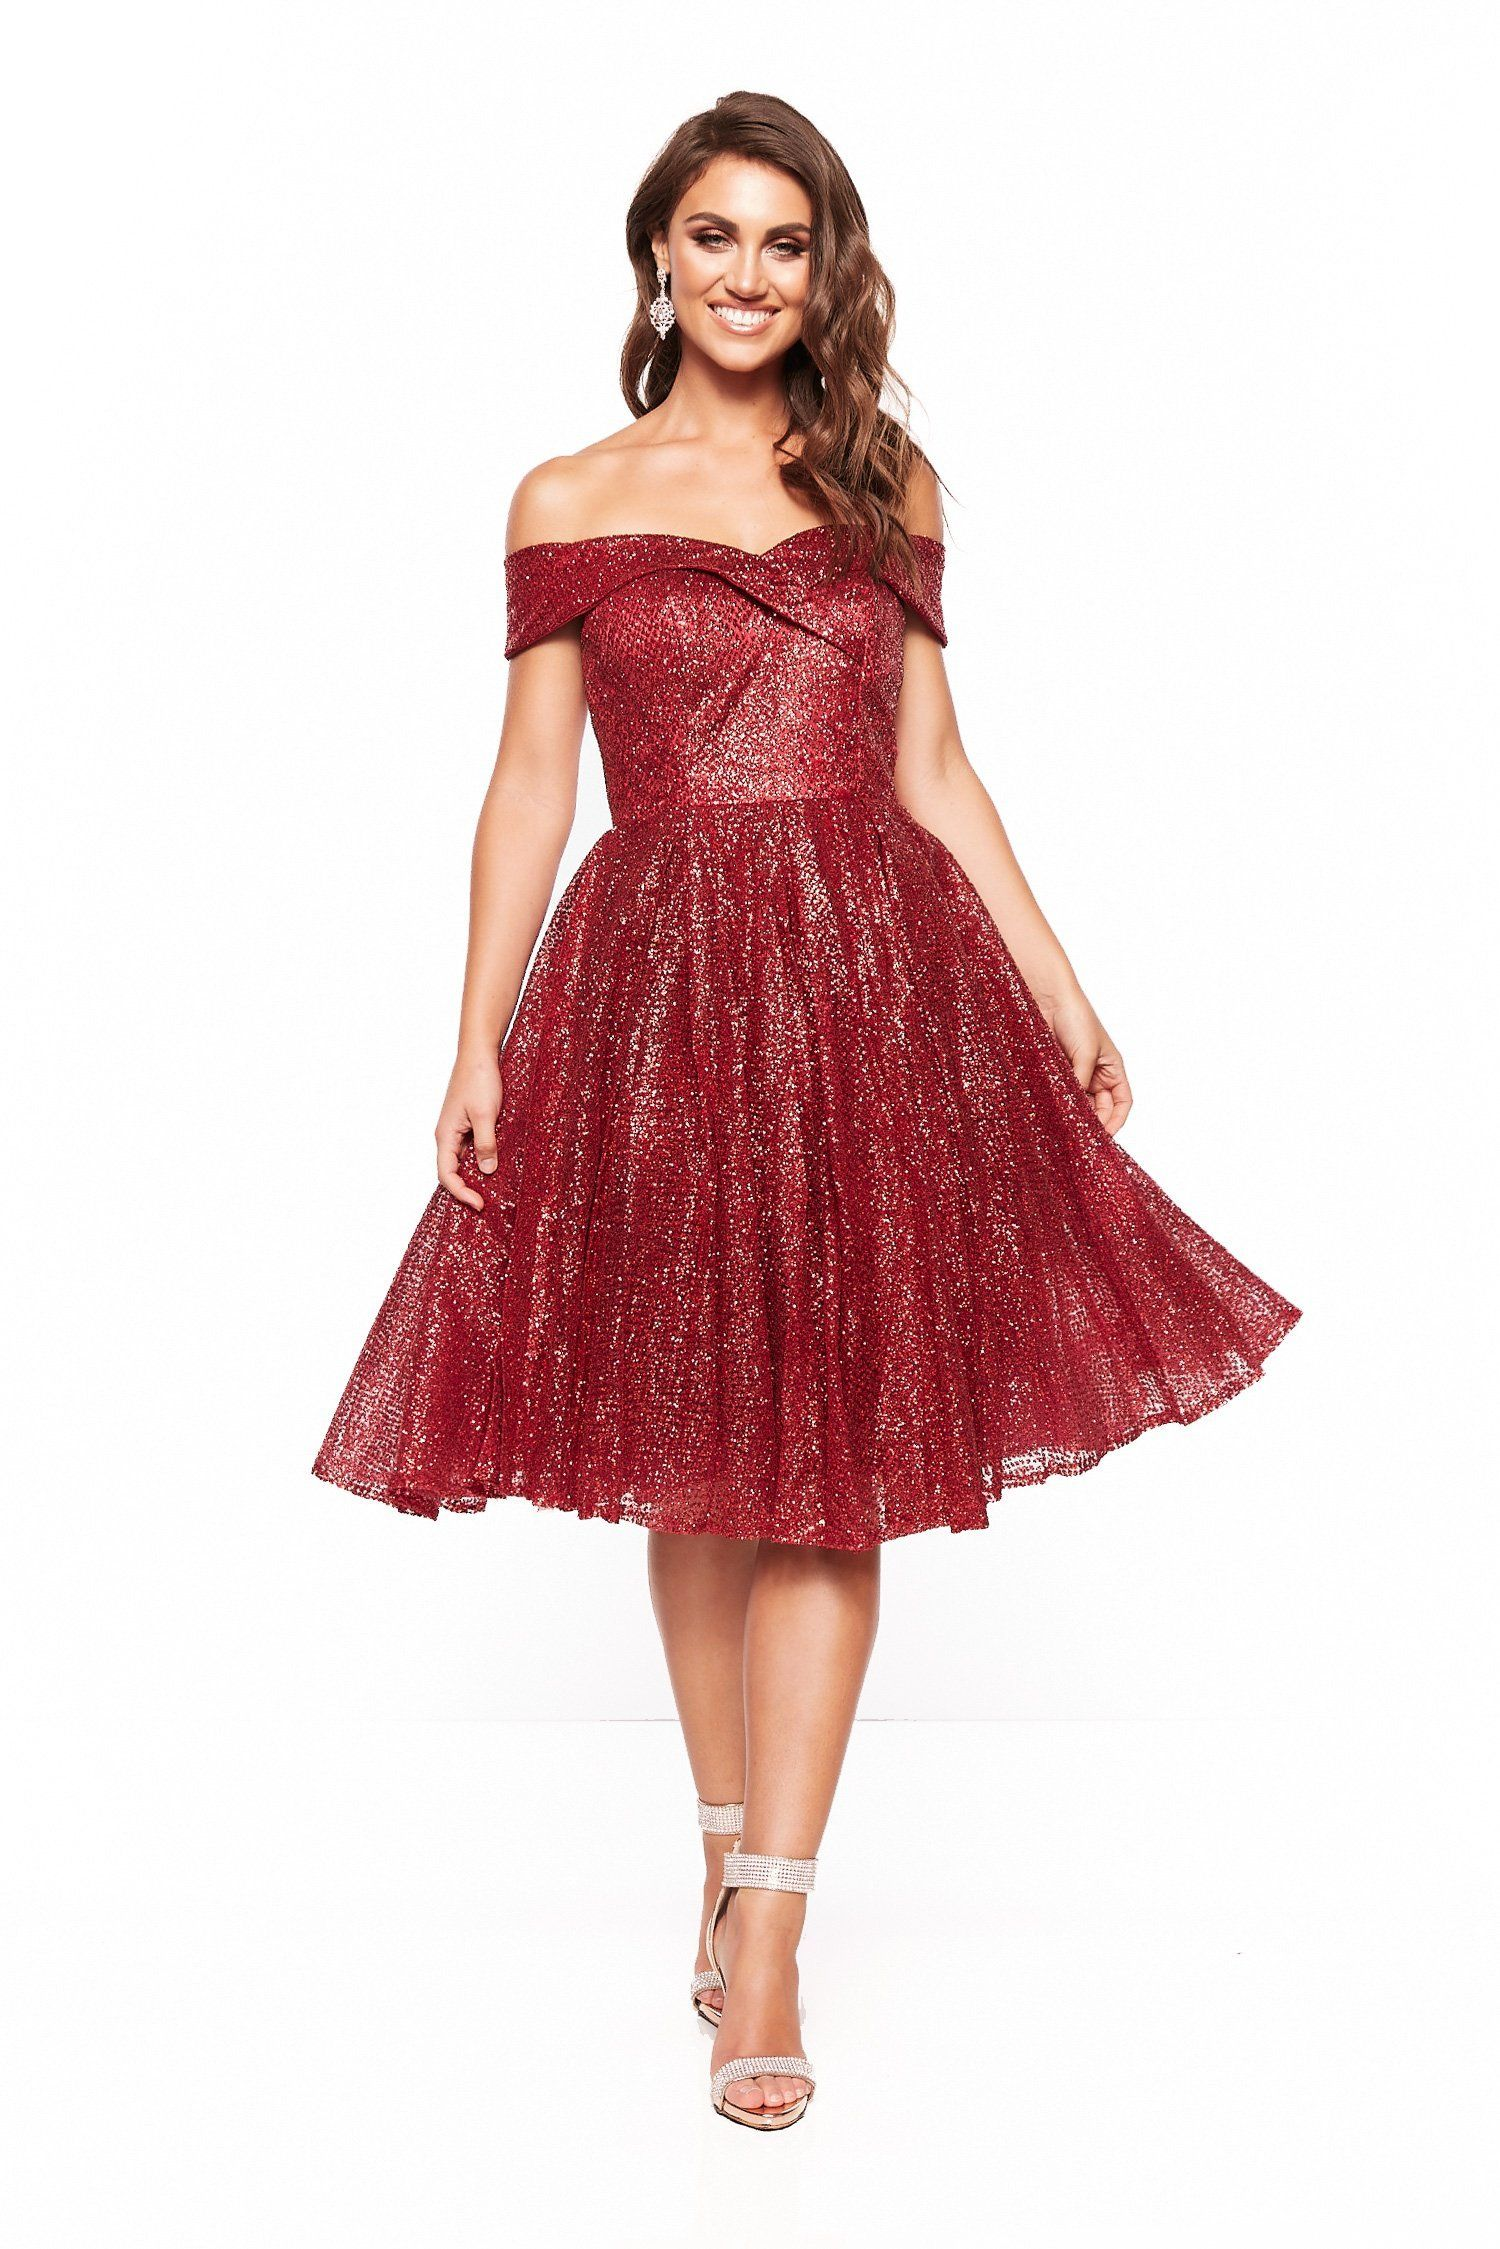 Red Glitter Cocktail Dress Cocktail Dress Red Cocktail Dress Dresses [ 2249 x 1500 Pixel ]